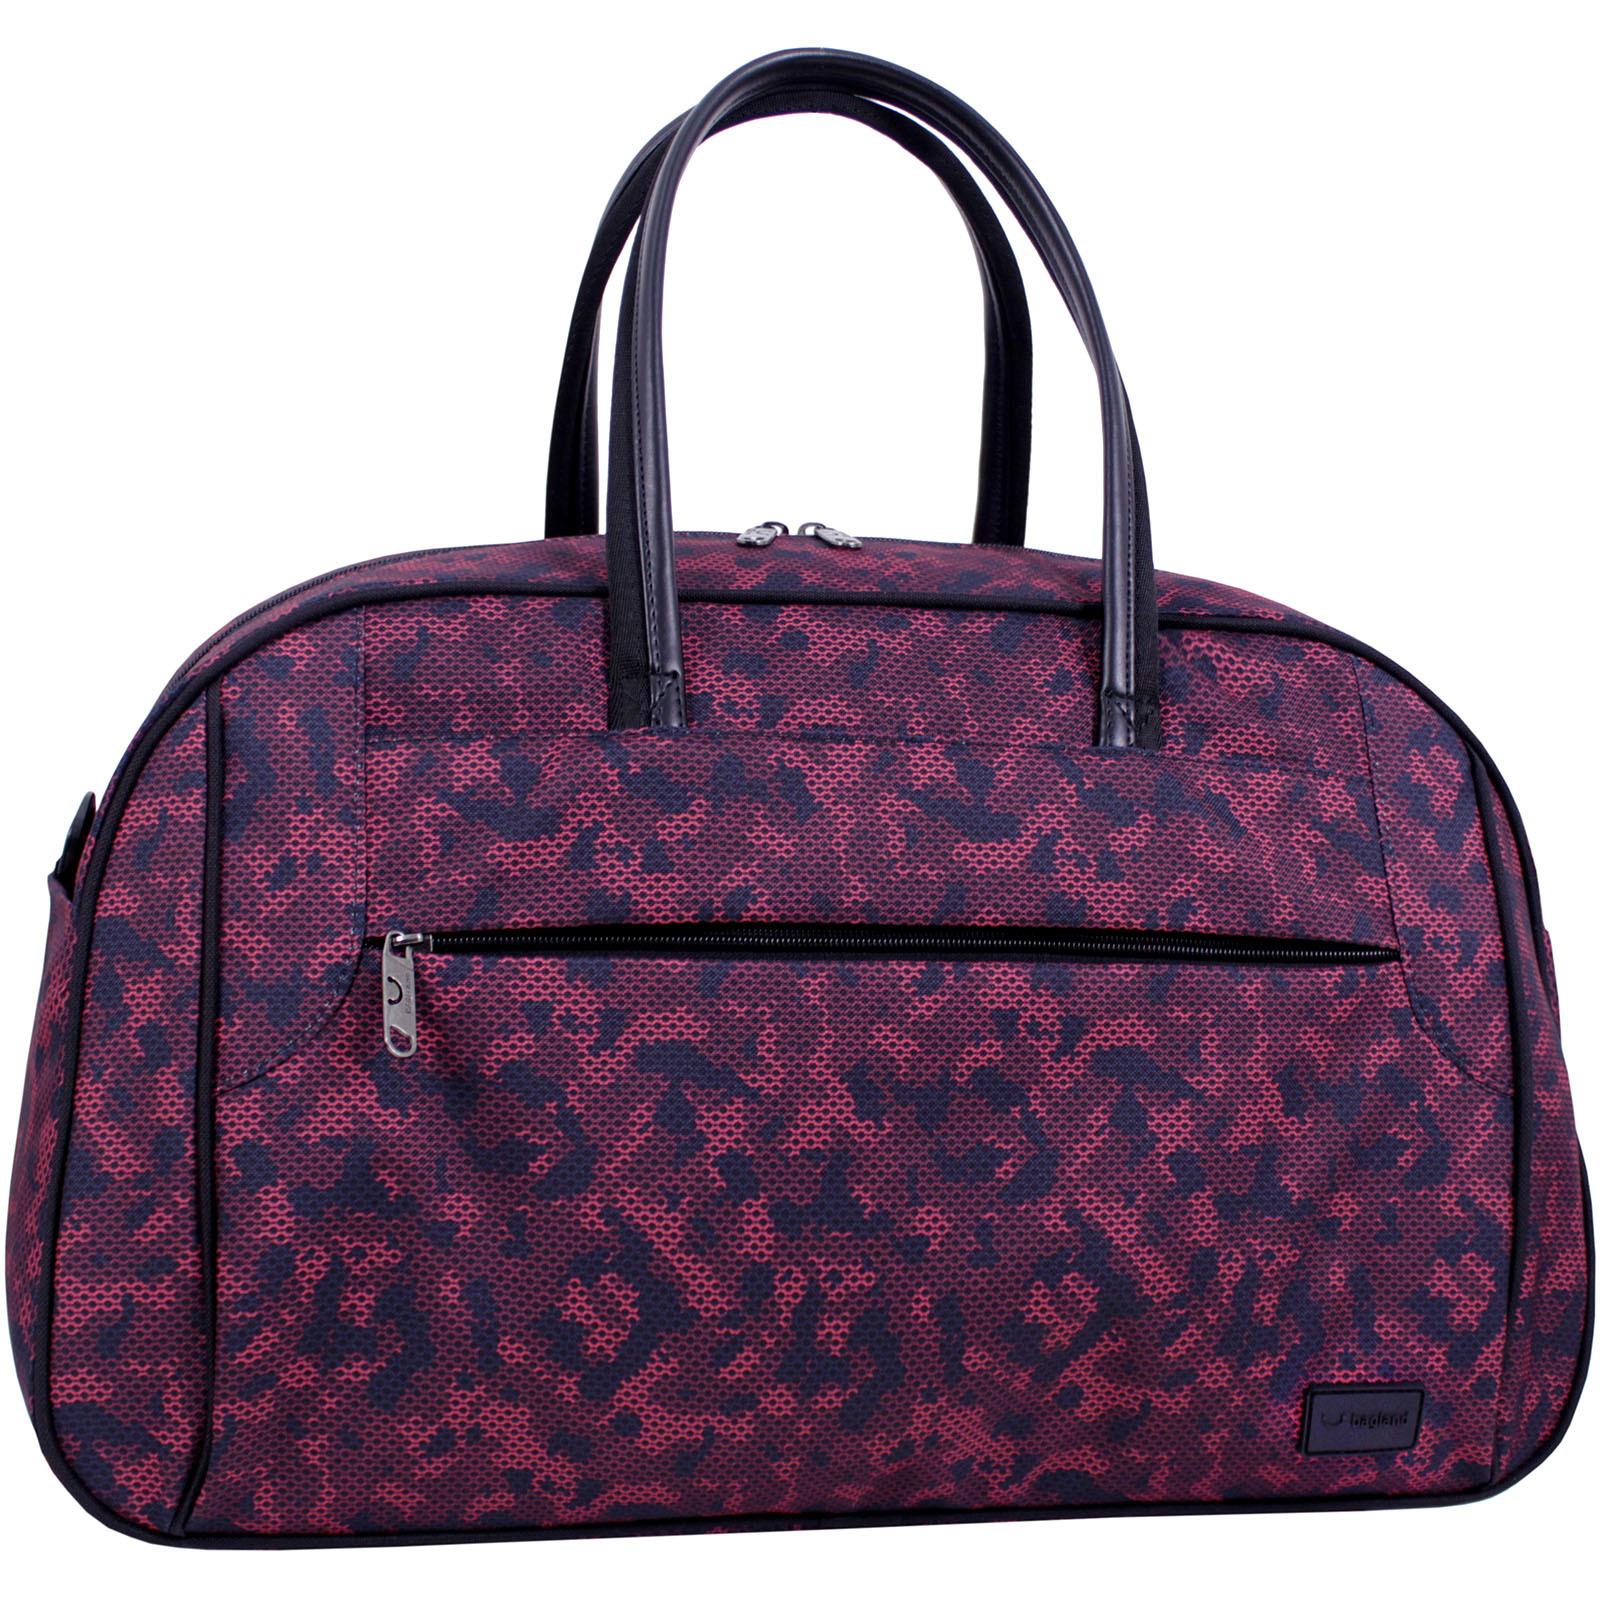 Спортивные сумки Сумка Bagland Тунис 34 л. Сублимация 466 (00390664) IMG_6885.JPG